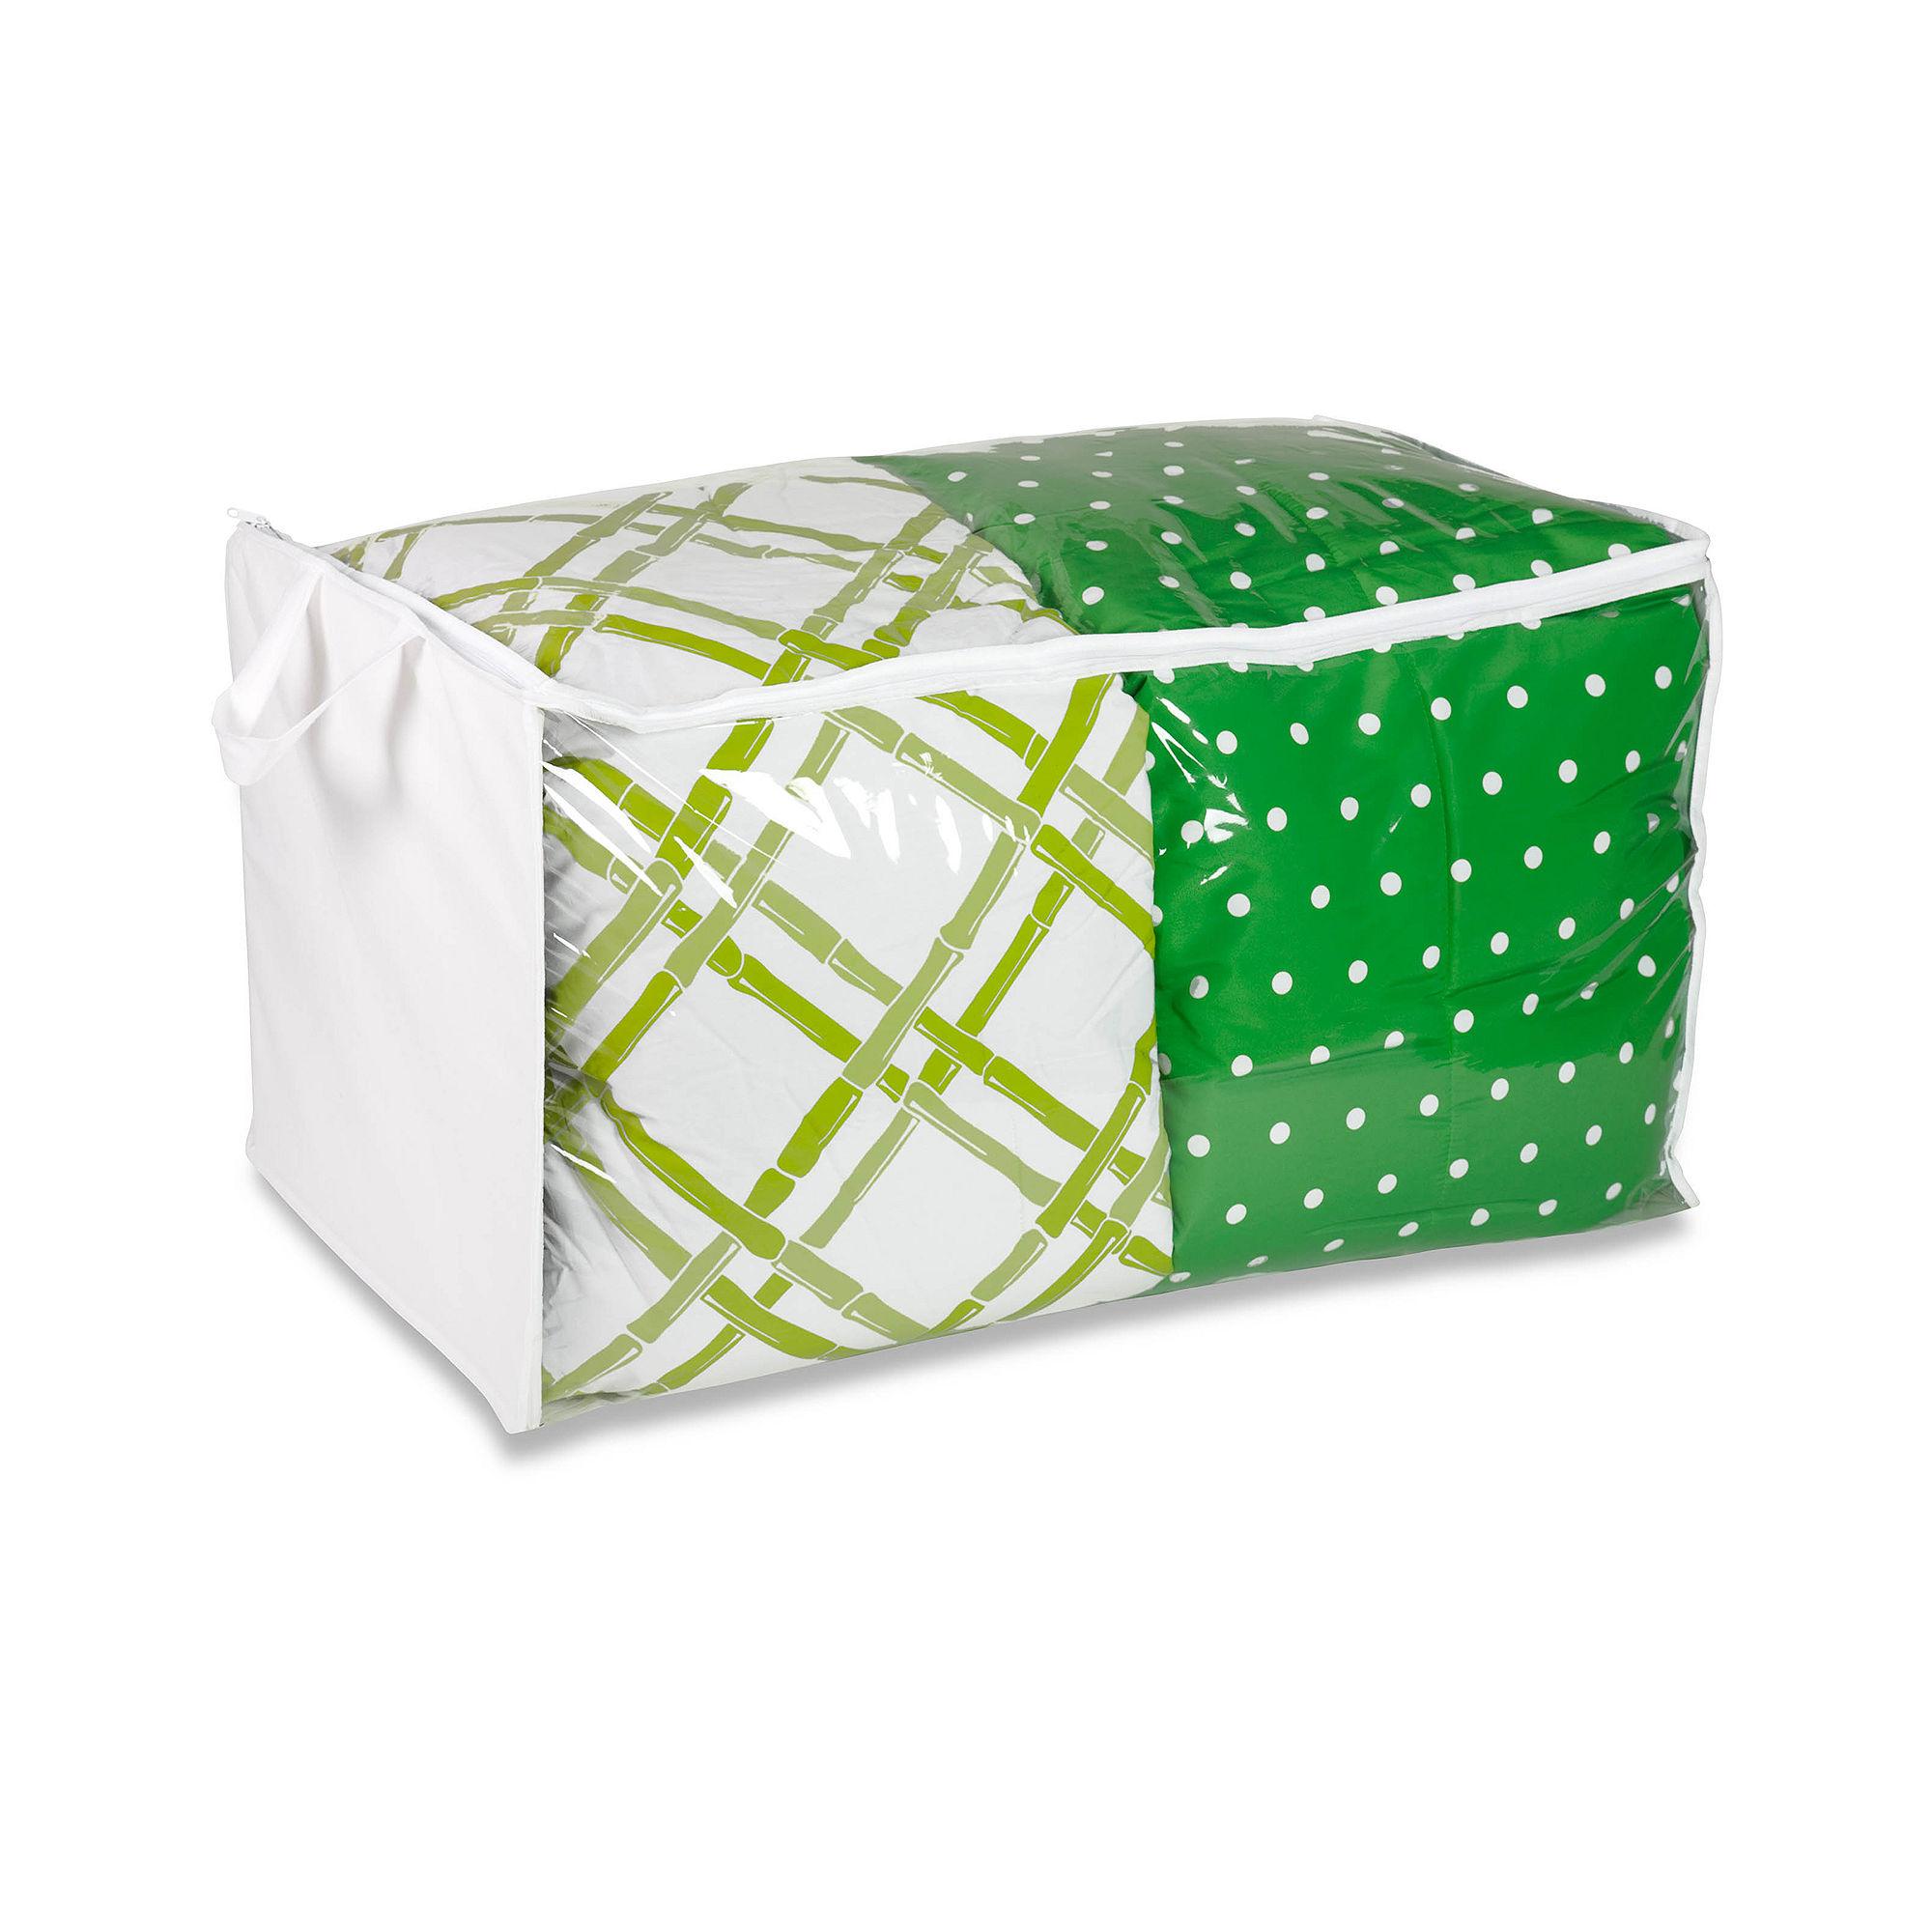 Honey-Can-Do Set of 2 Jumbo Storage Bags